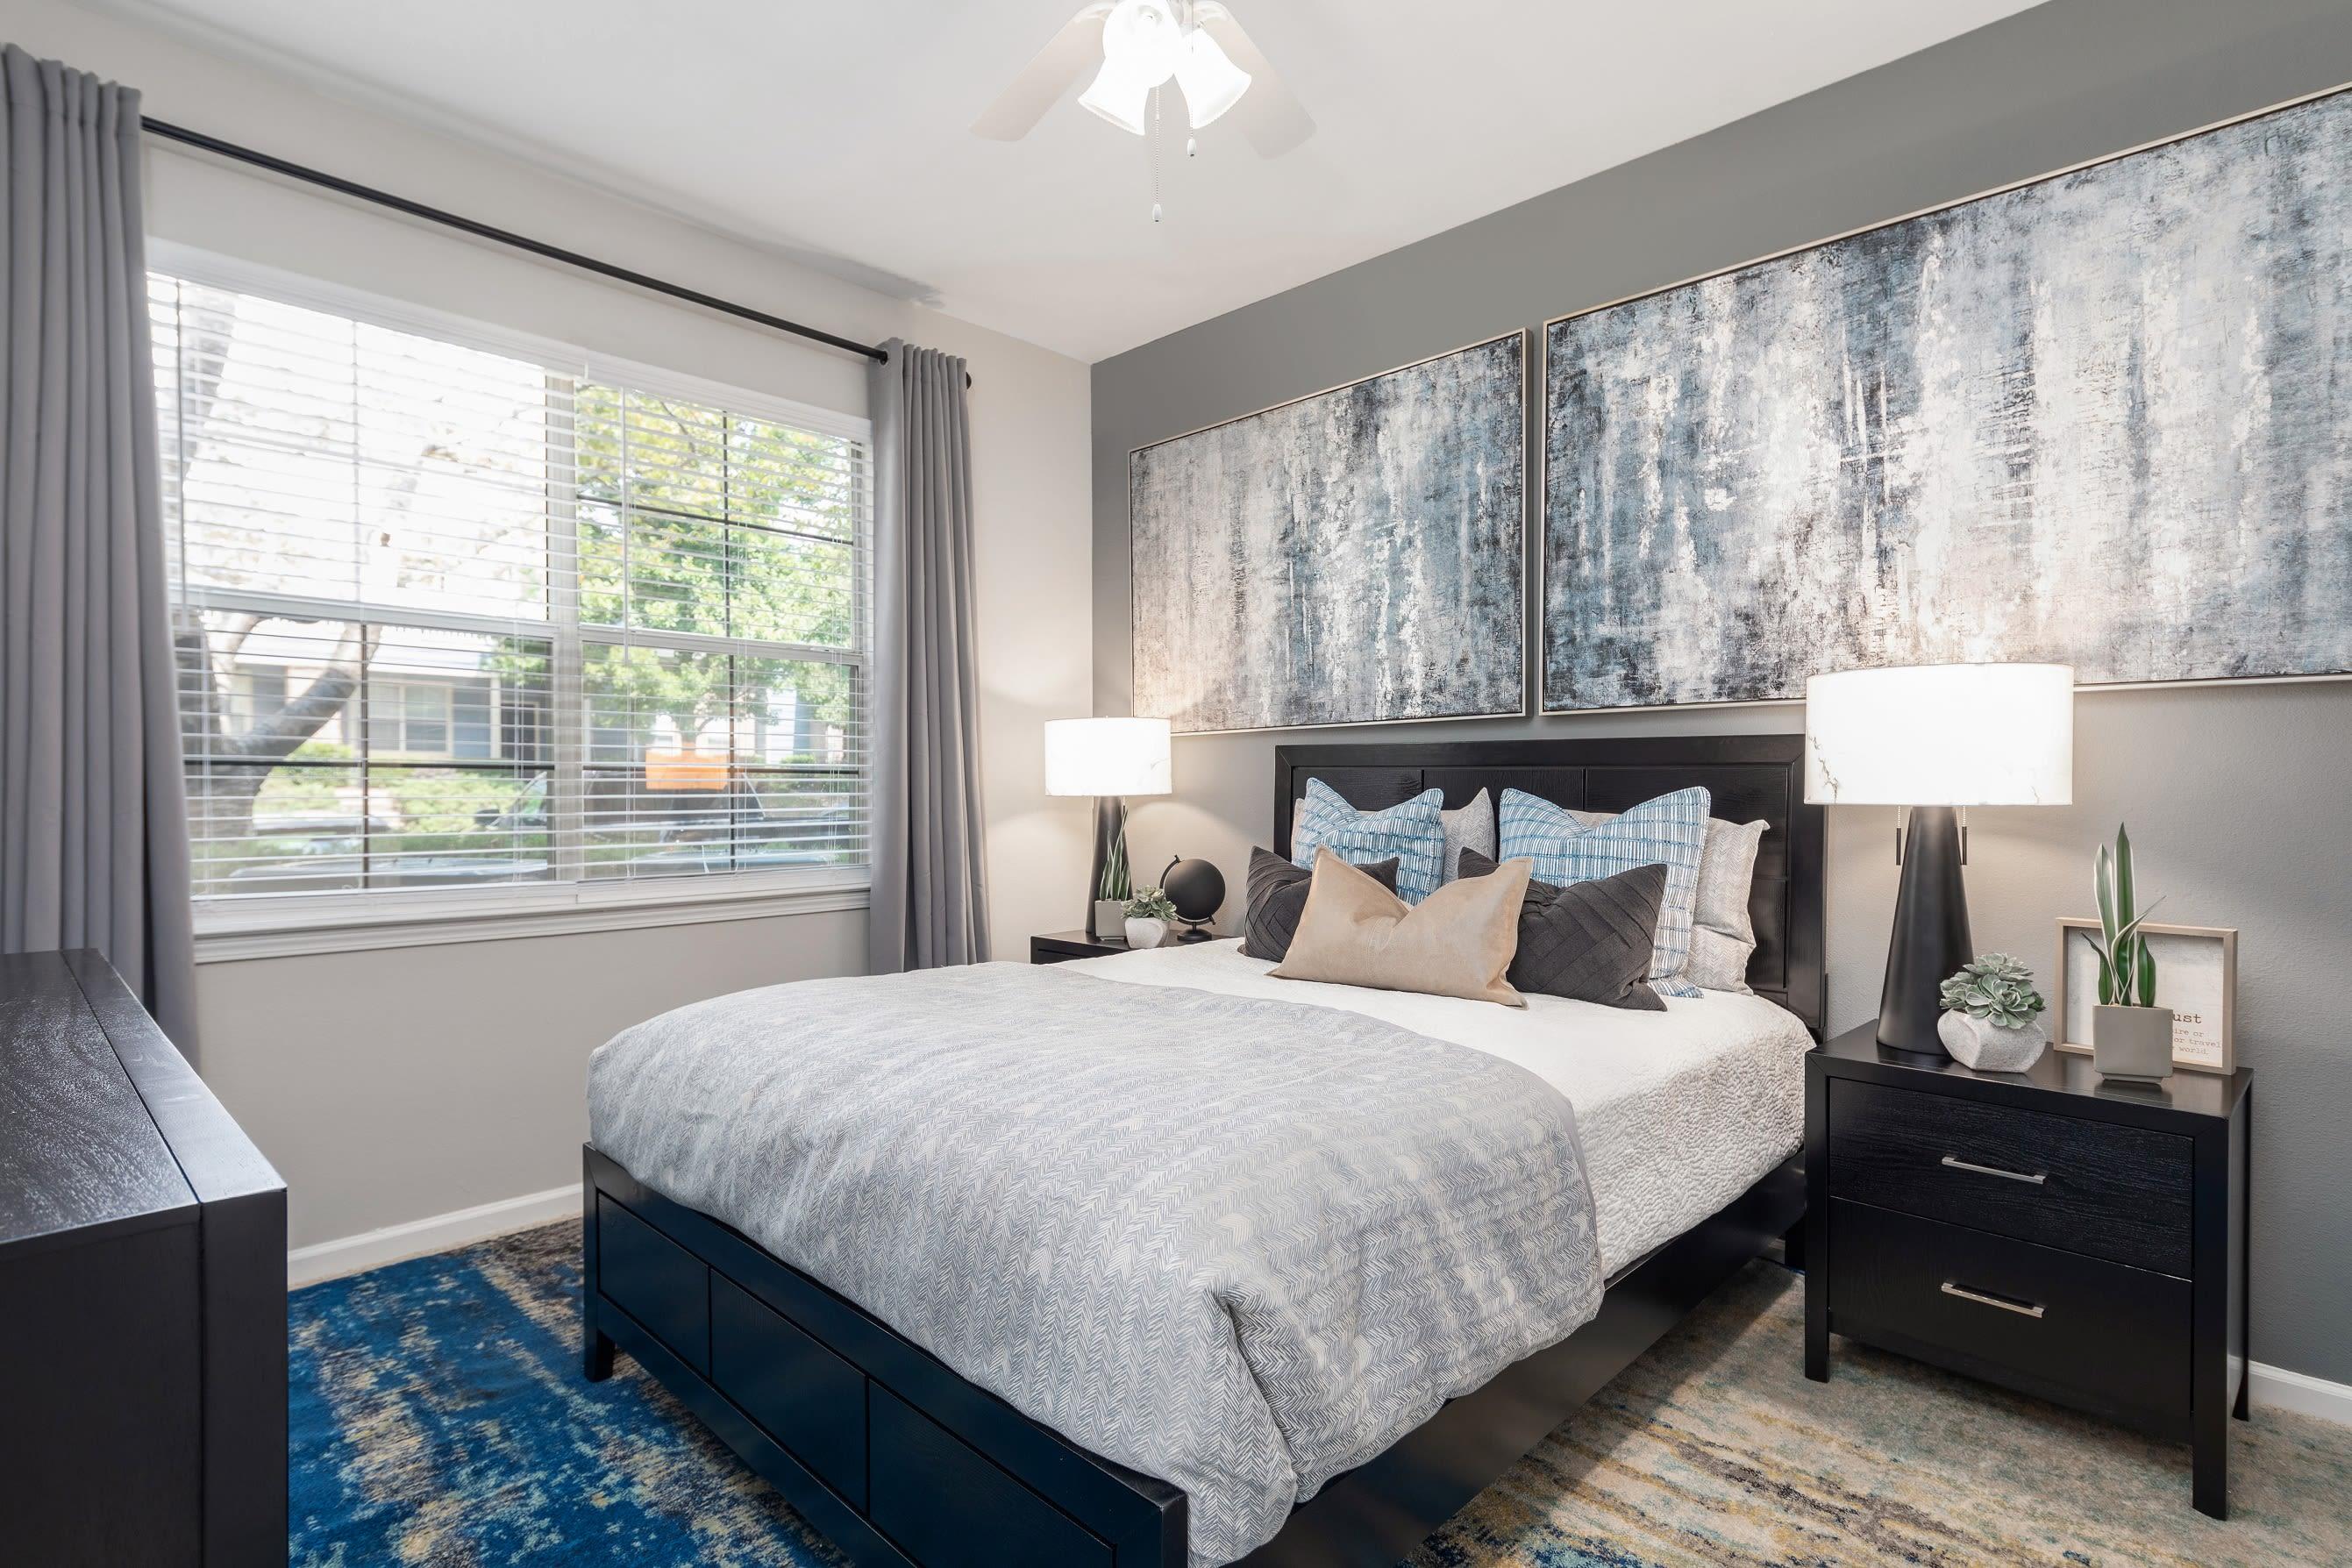 Main bedroom at Highlands at Alexander Pointe in Charlotte, North Carolina